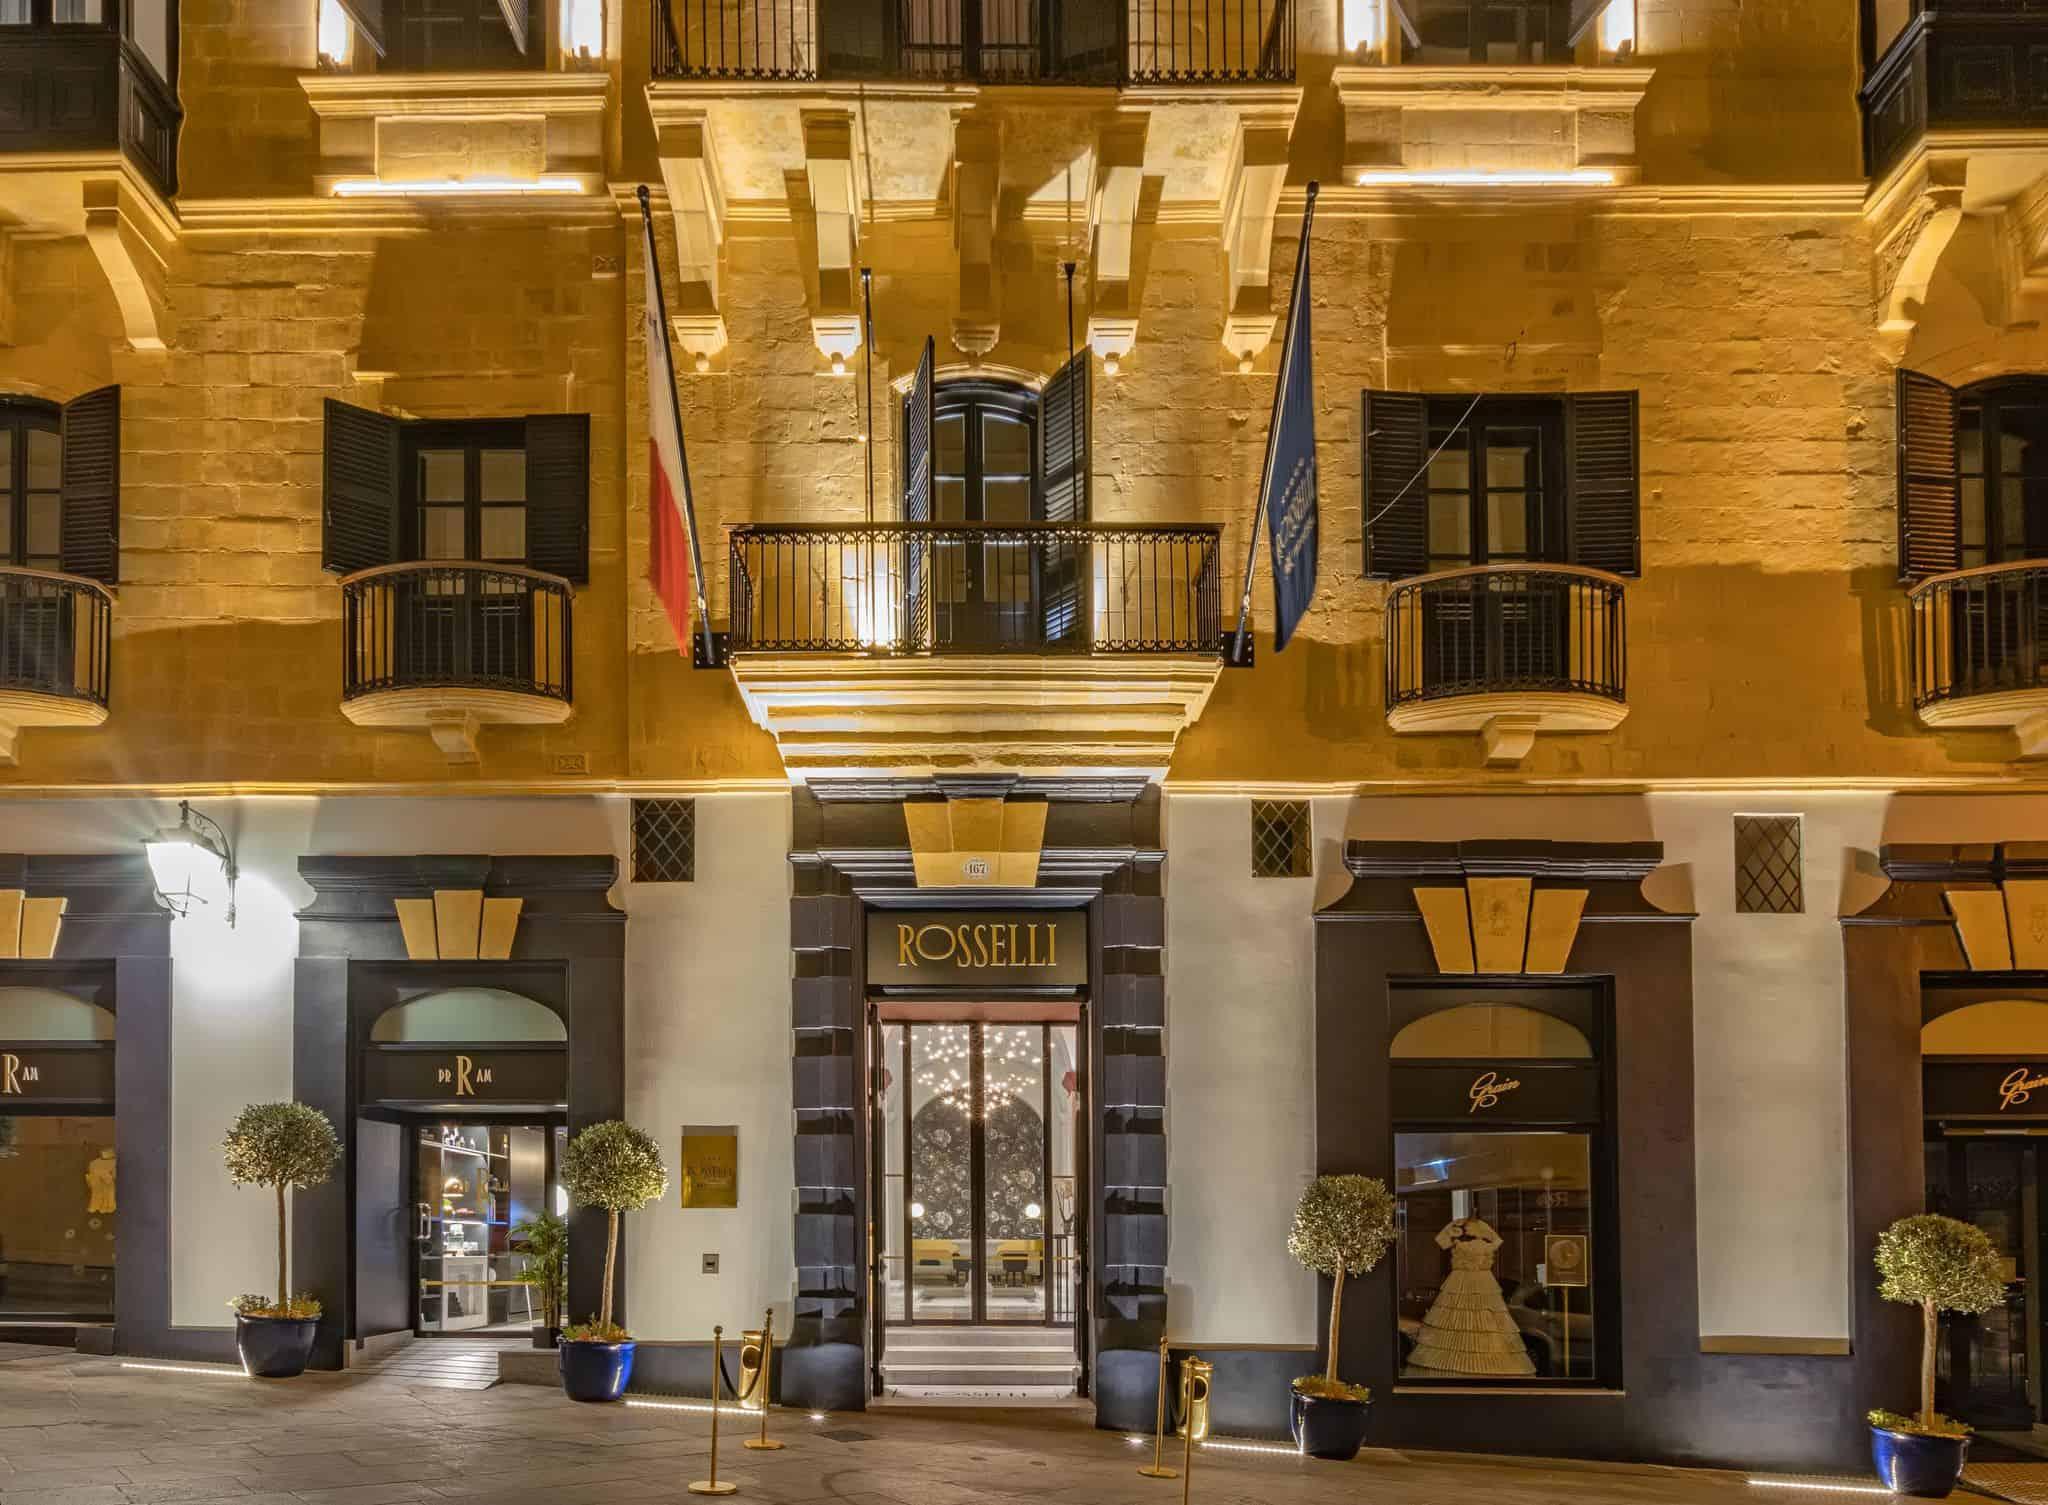 AX Rosselli Hotel